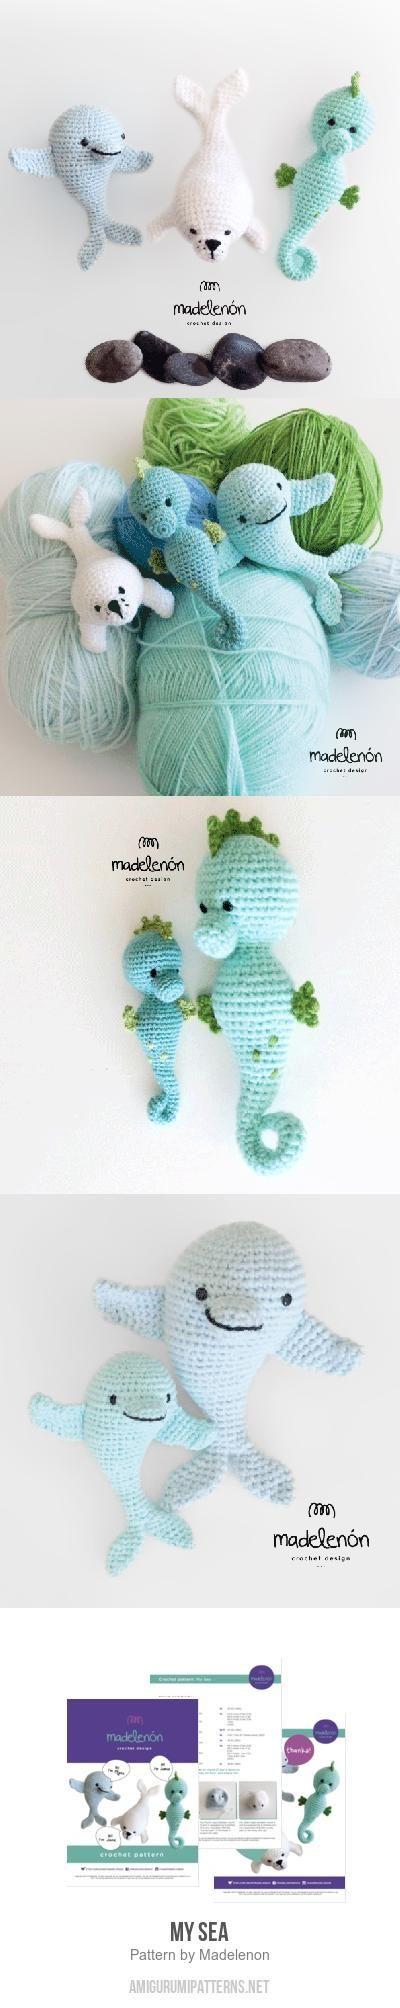 My sea amigurumi pattern by Madelenon | Amigurumi, Patterns and Crochet